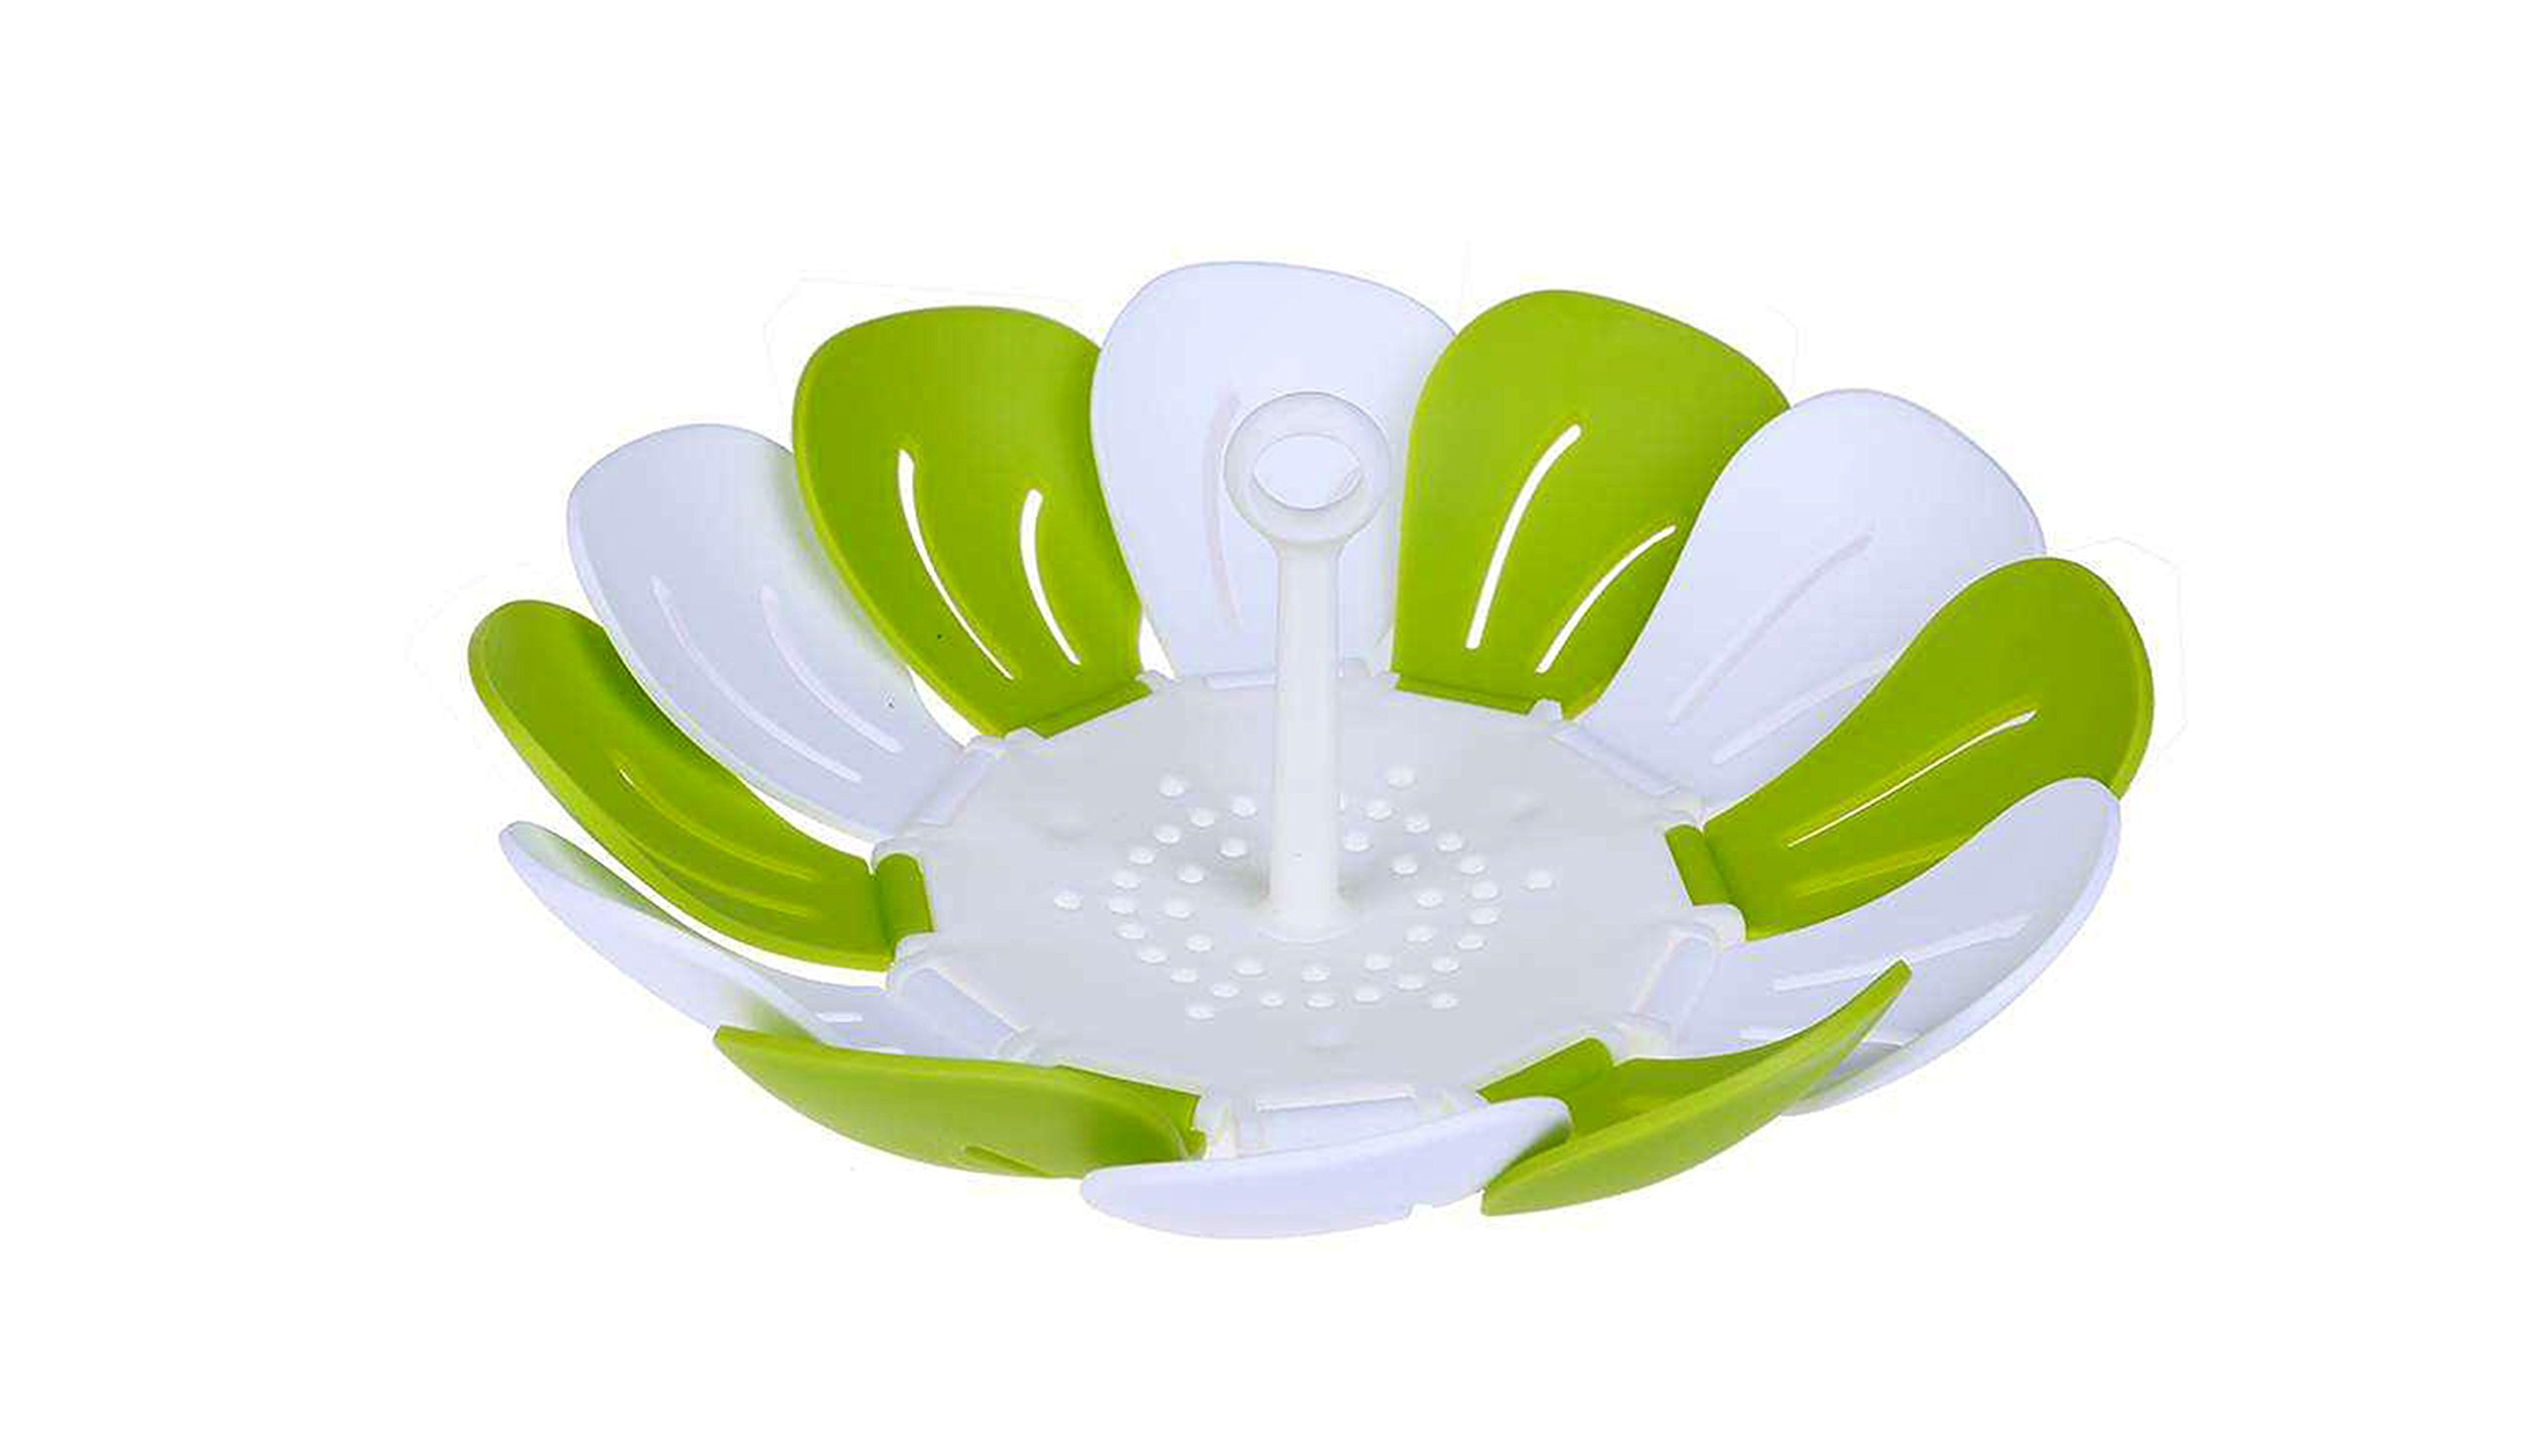 Bioexcel Silicone Vegetable Steamer Rack 26 cm / 10 Inch Multi Purpose Premium Quality Steamer Tray Vegetable Steamer Basket